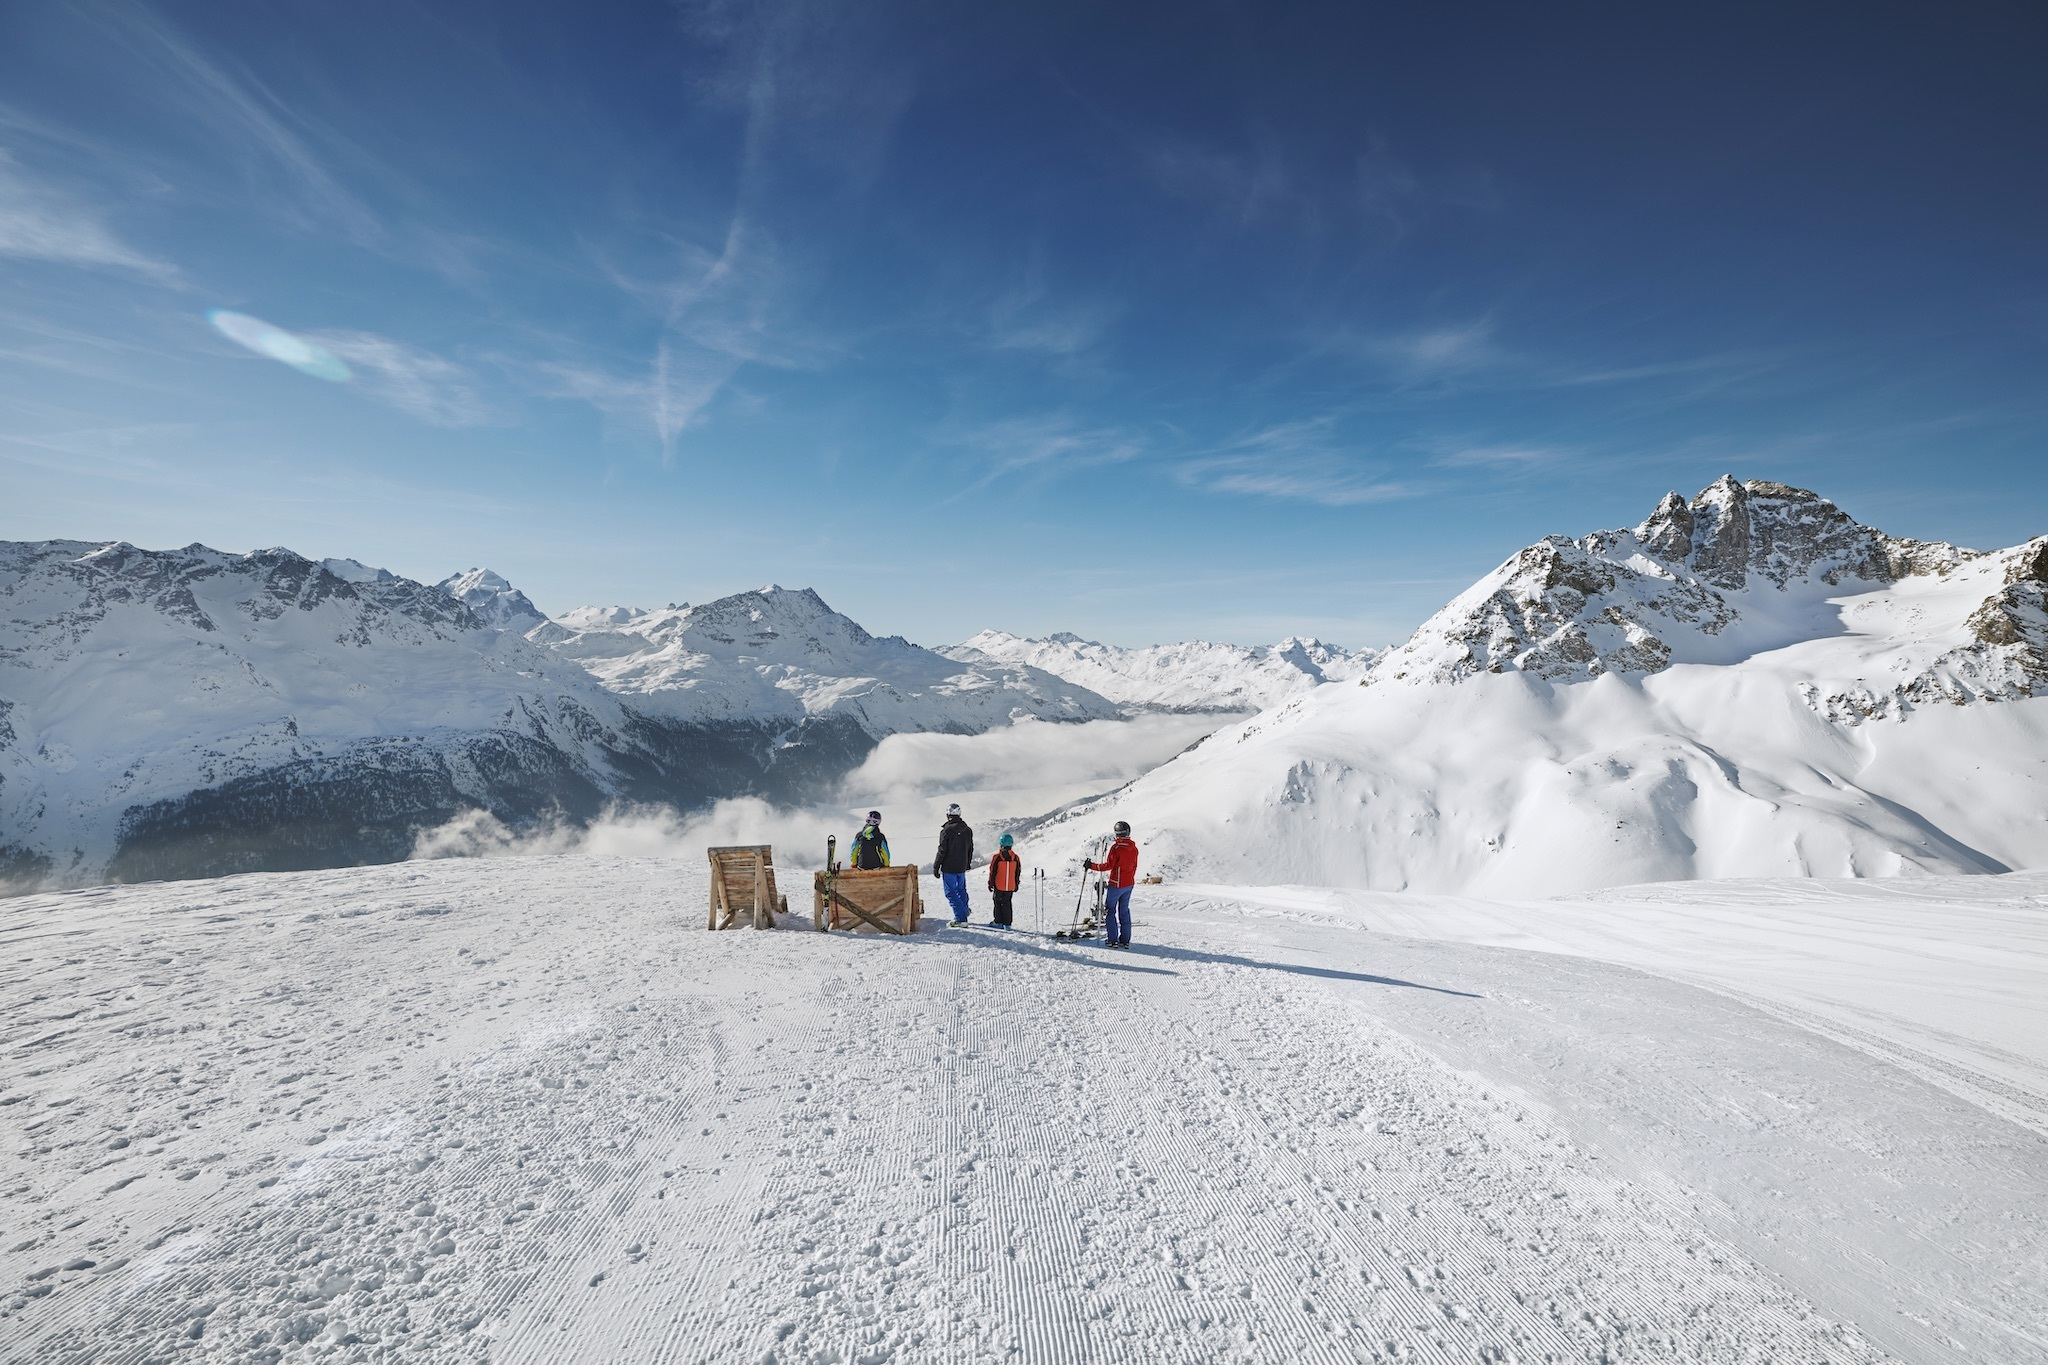 Snow Deal, St Moritz, Engadin